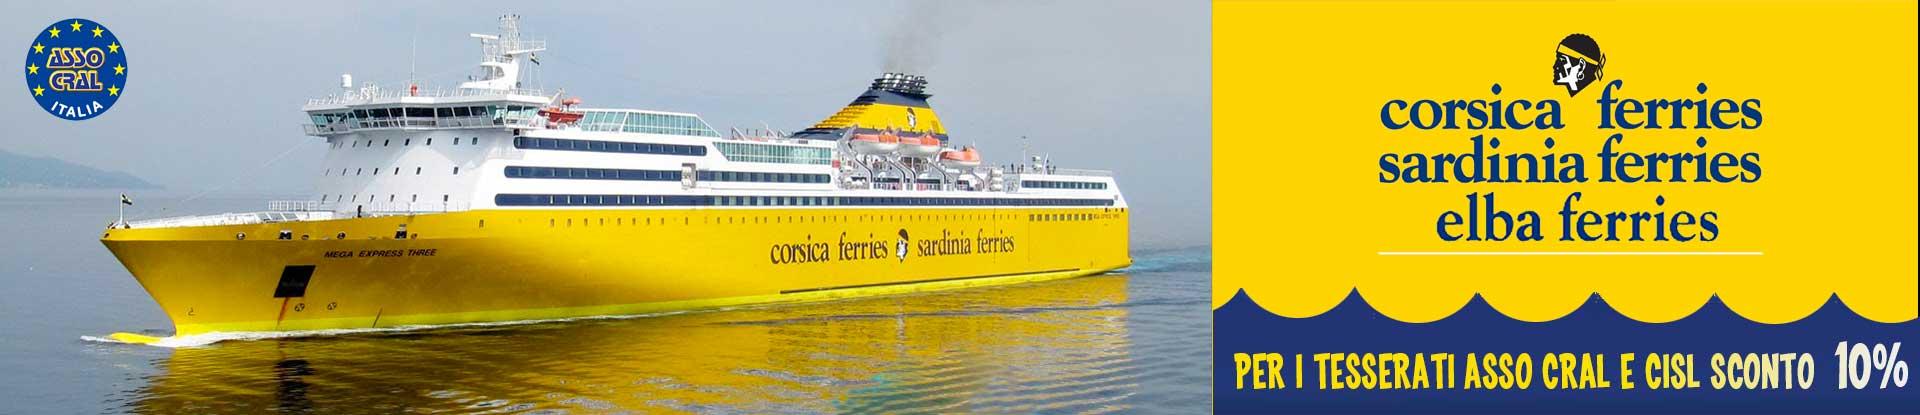 SARDINIA CORSICA ELBA Ferries